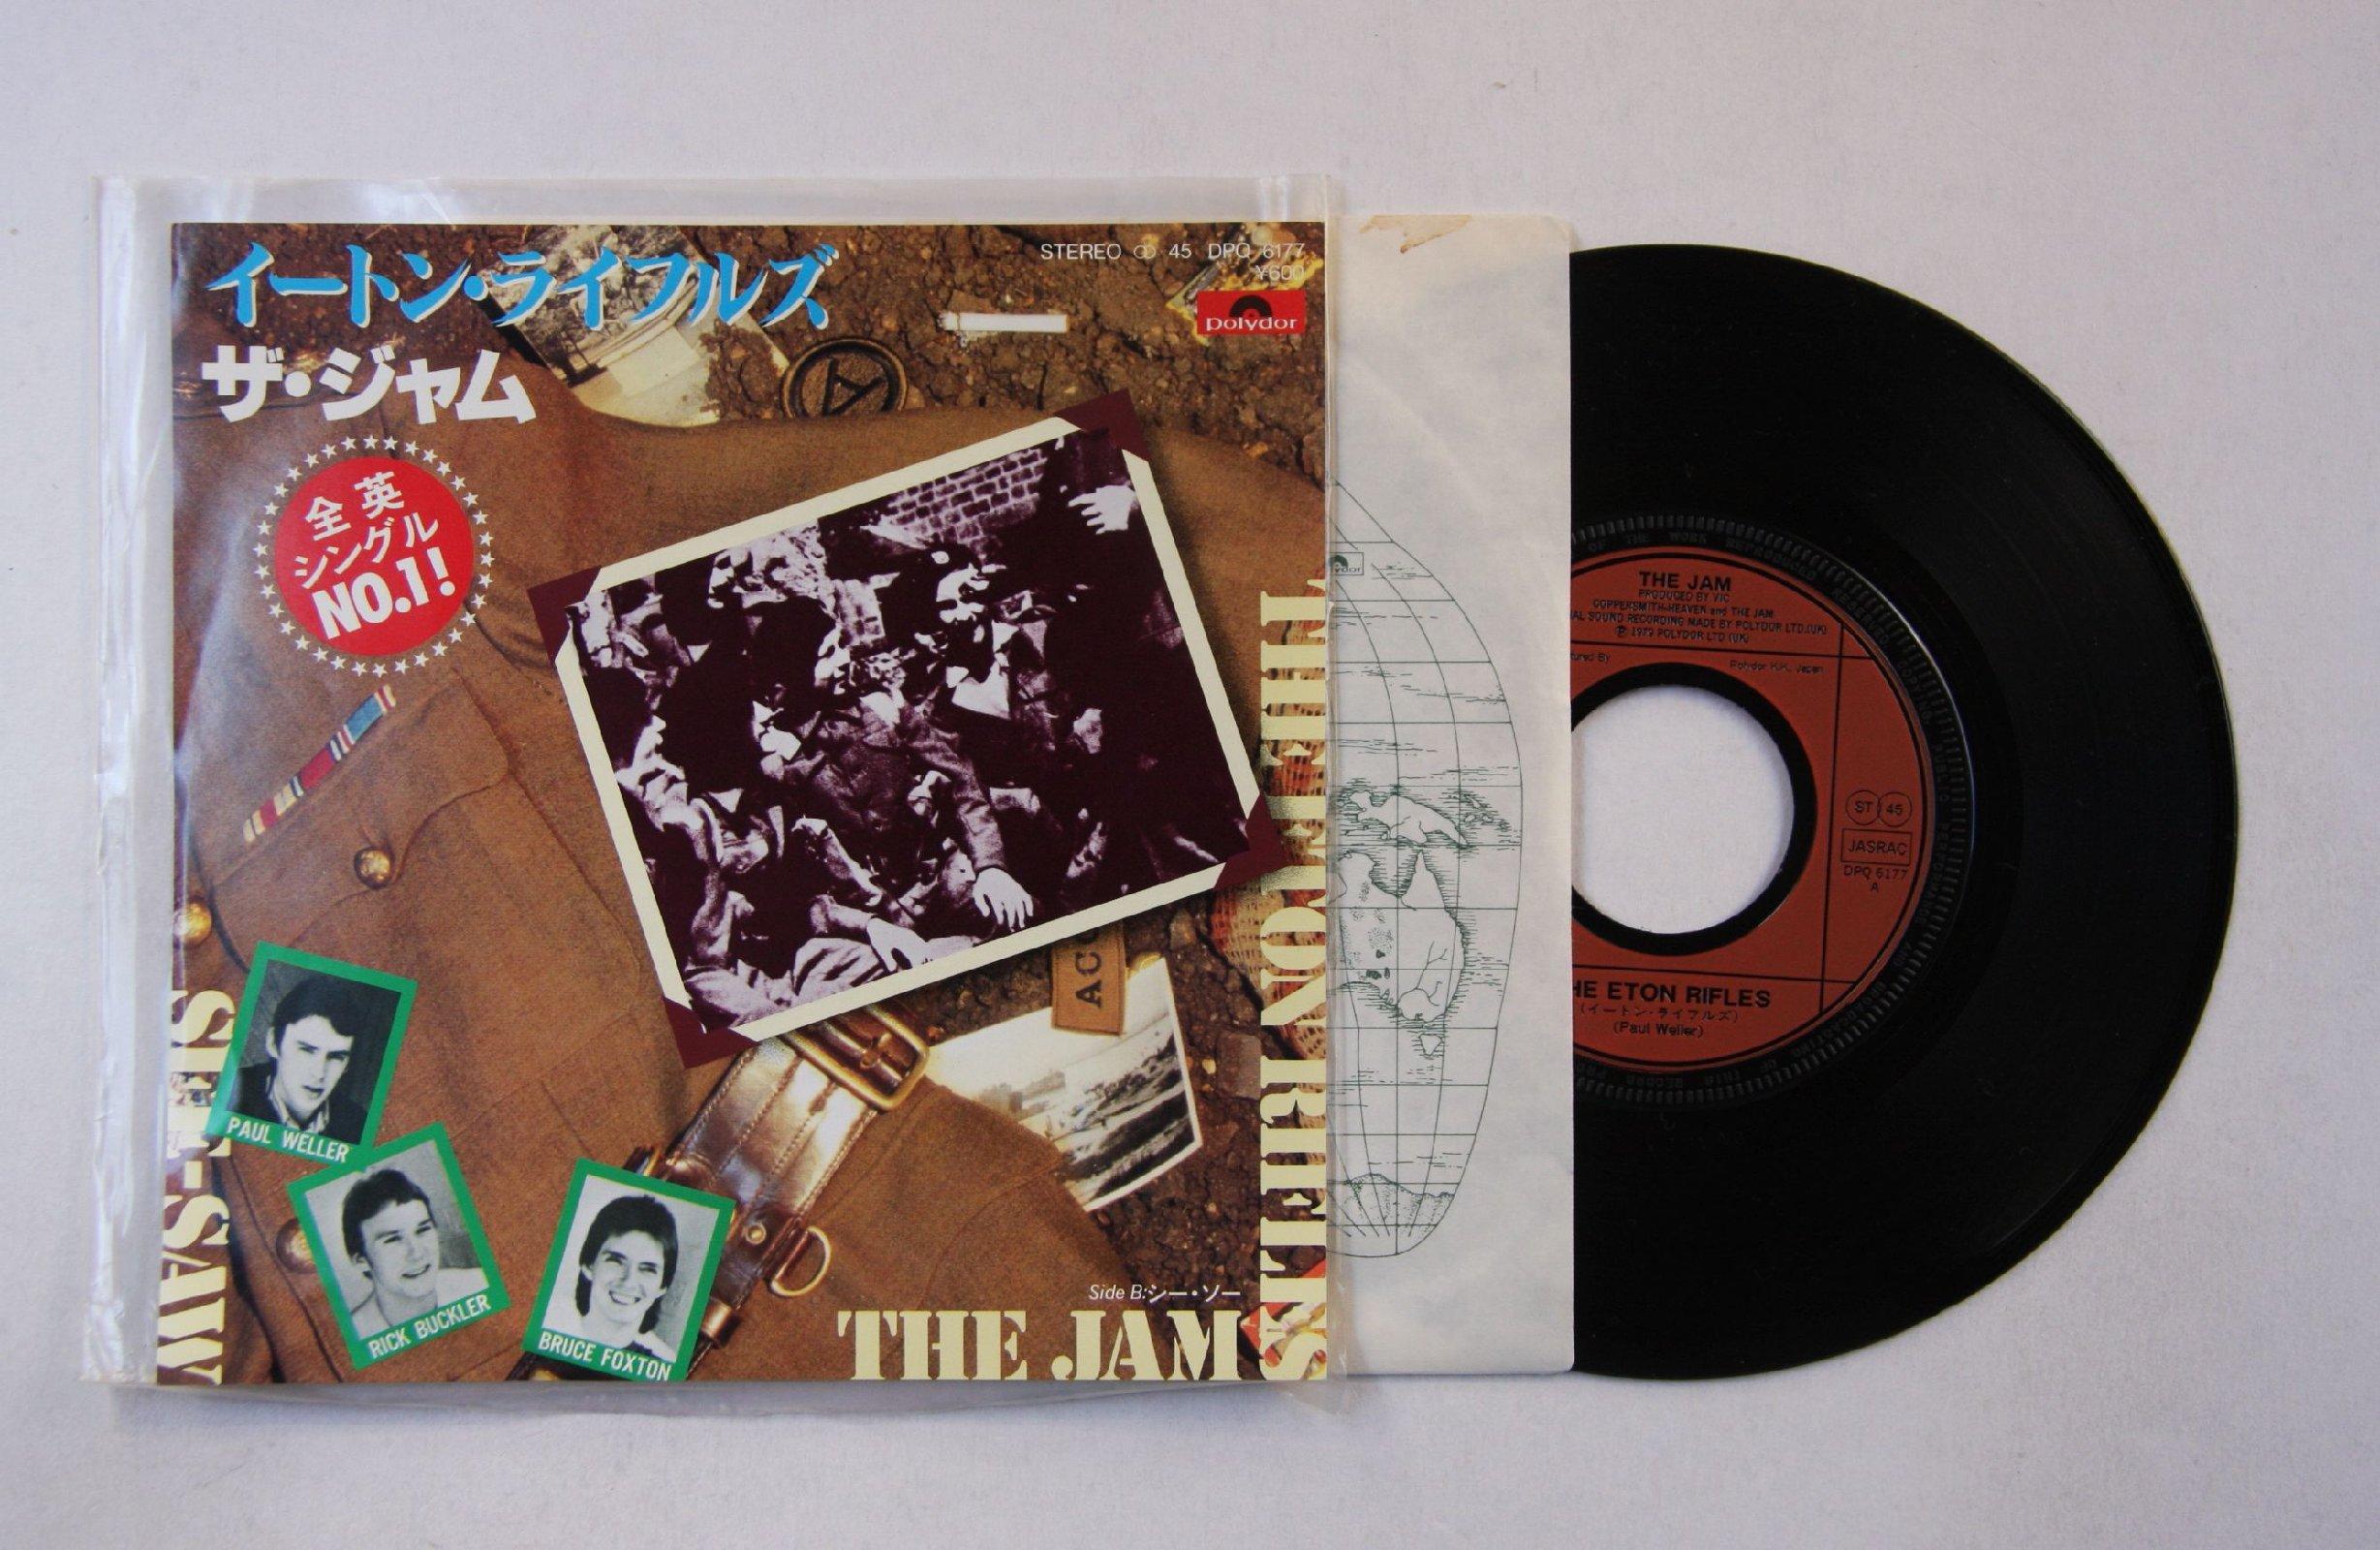 Jam - The Eton Rifles Vinyl